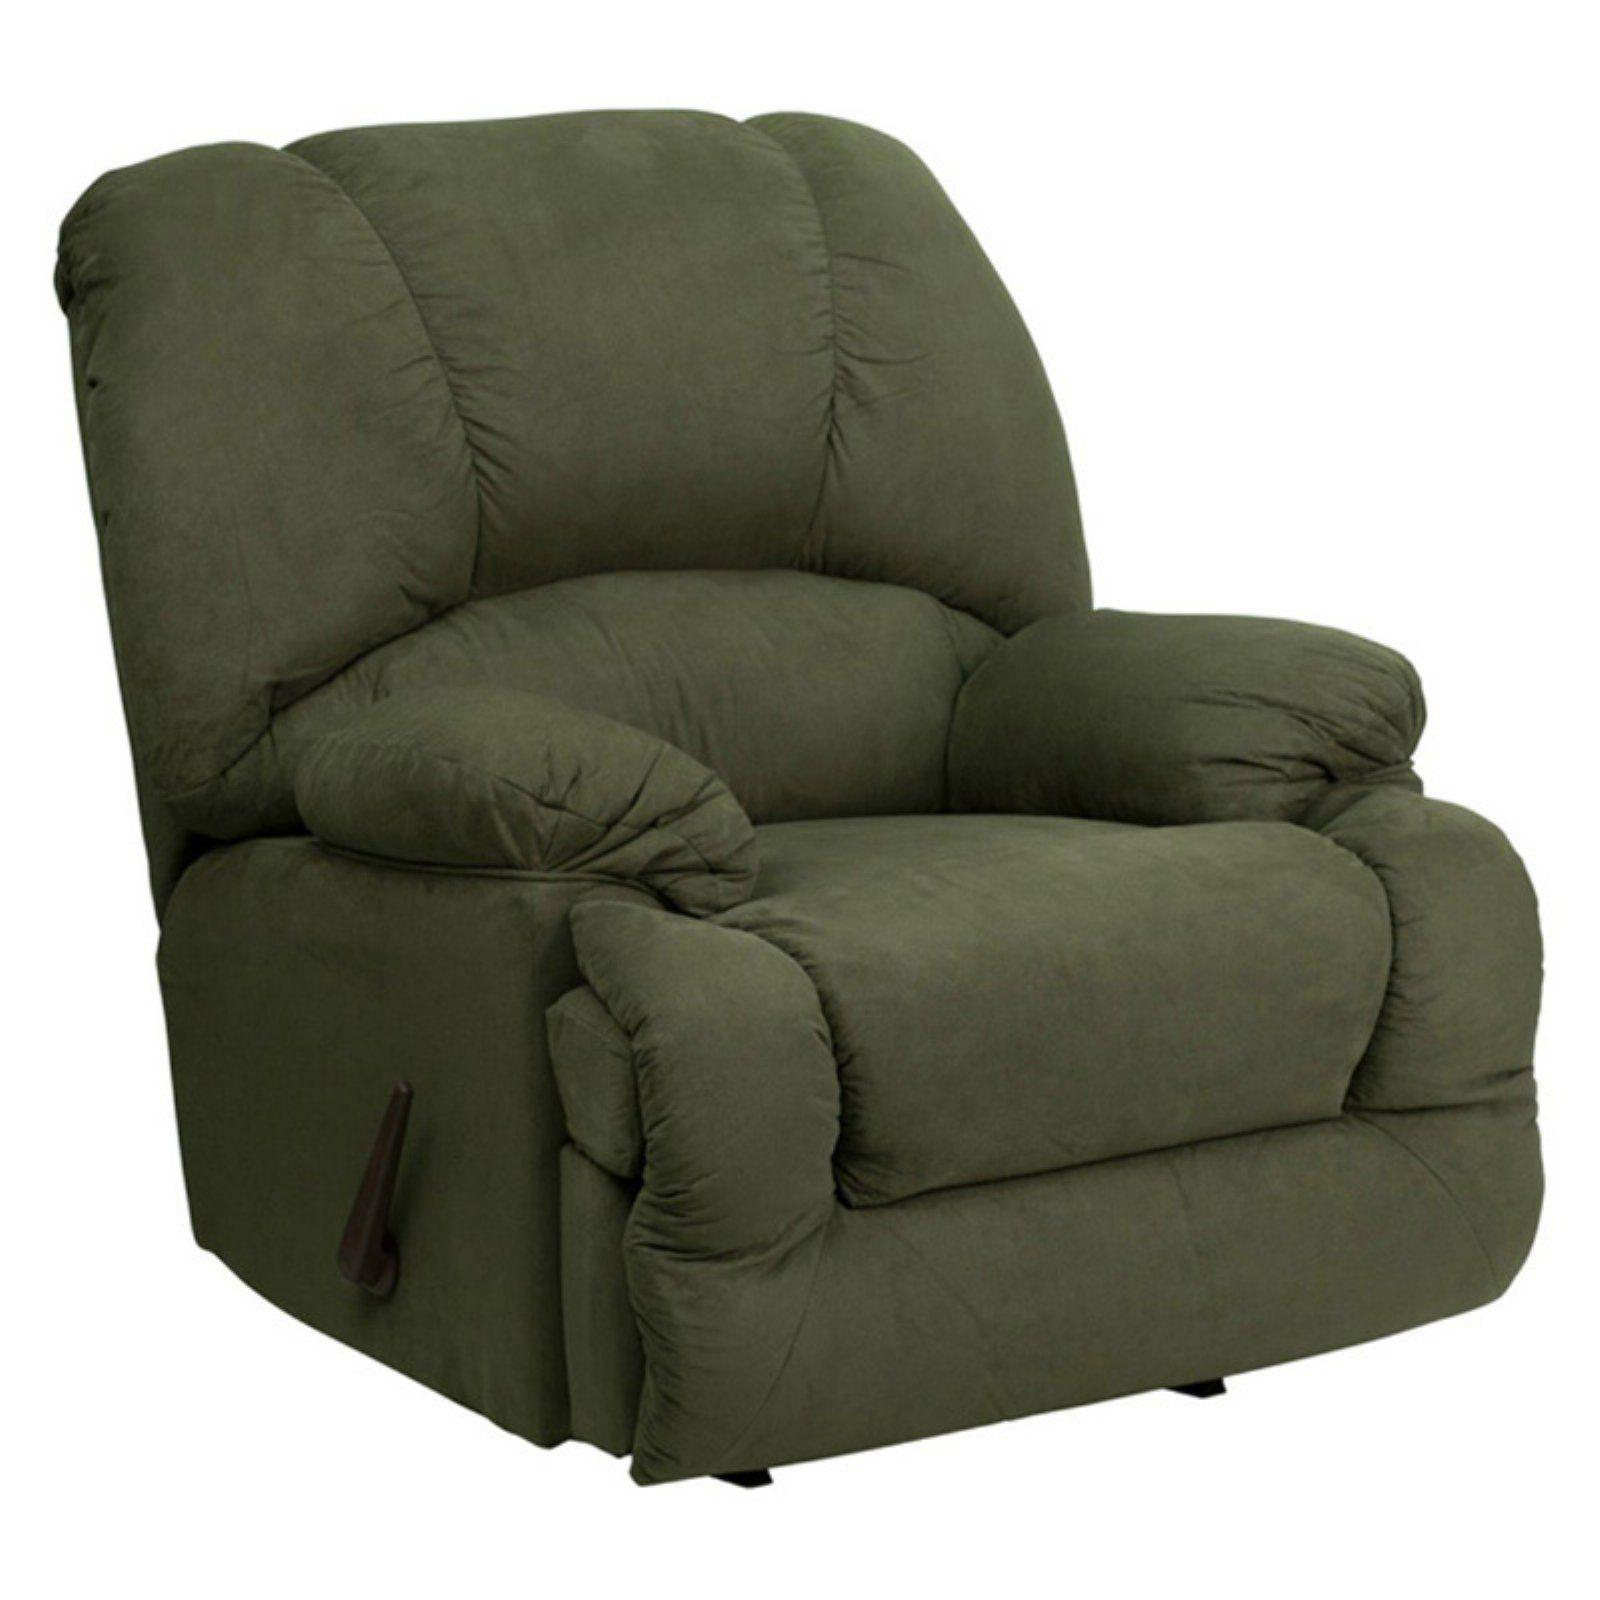 Flash Furniture Glacier Microfiber Rocker Recliner Olive Recliner Rocker Recliners Flash Furniture